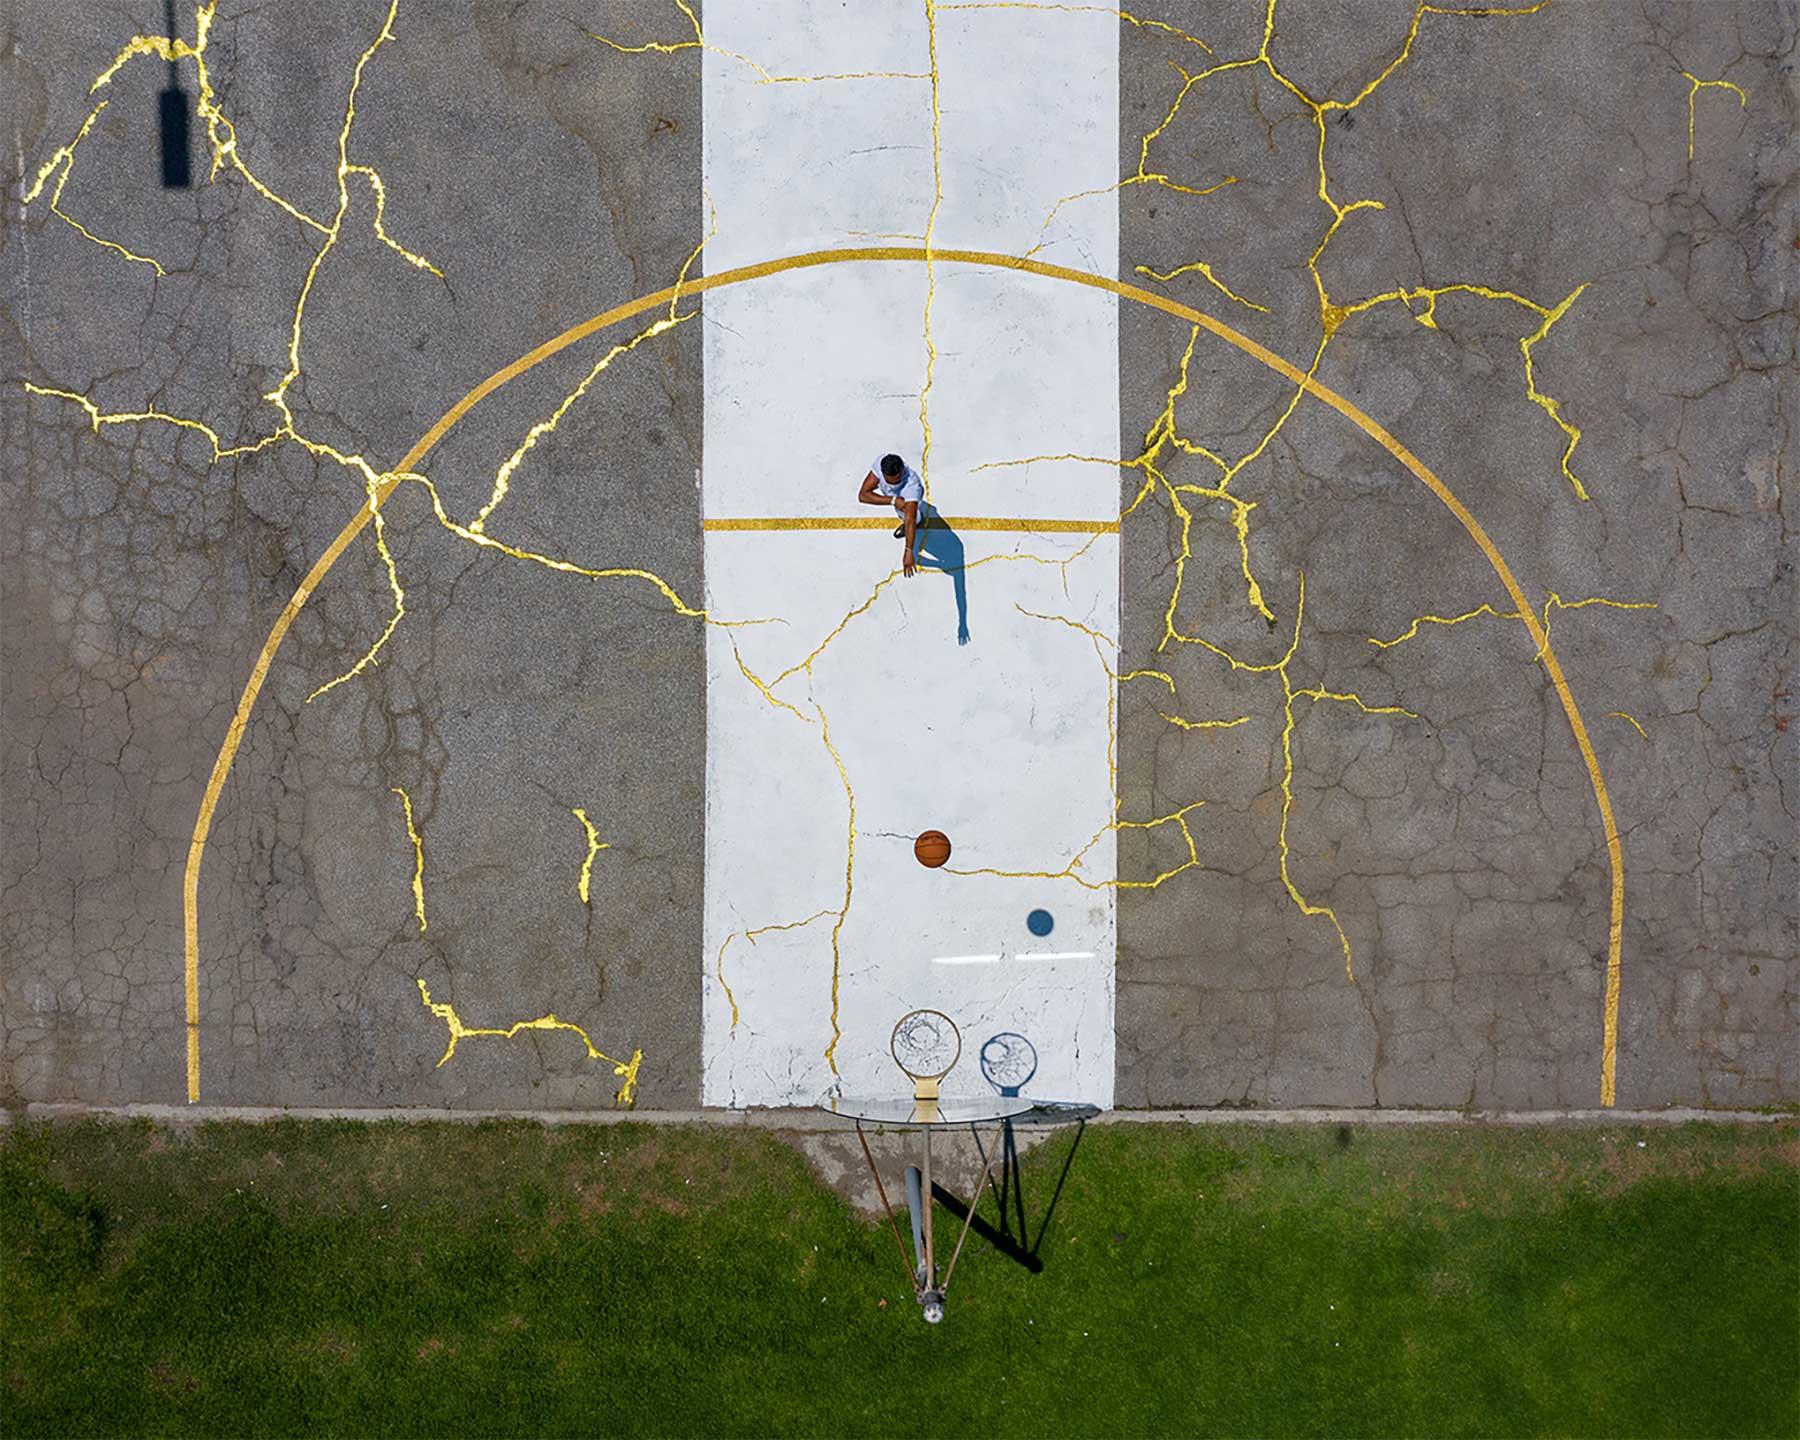 Basketball-Platz im Kintsugi-Stil Kintsugi-Basketballplatz-Victor-Solomon_06